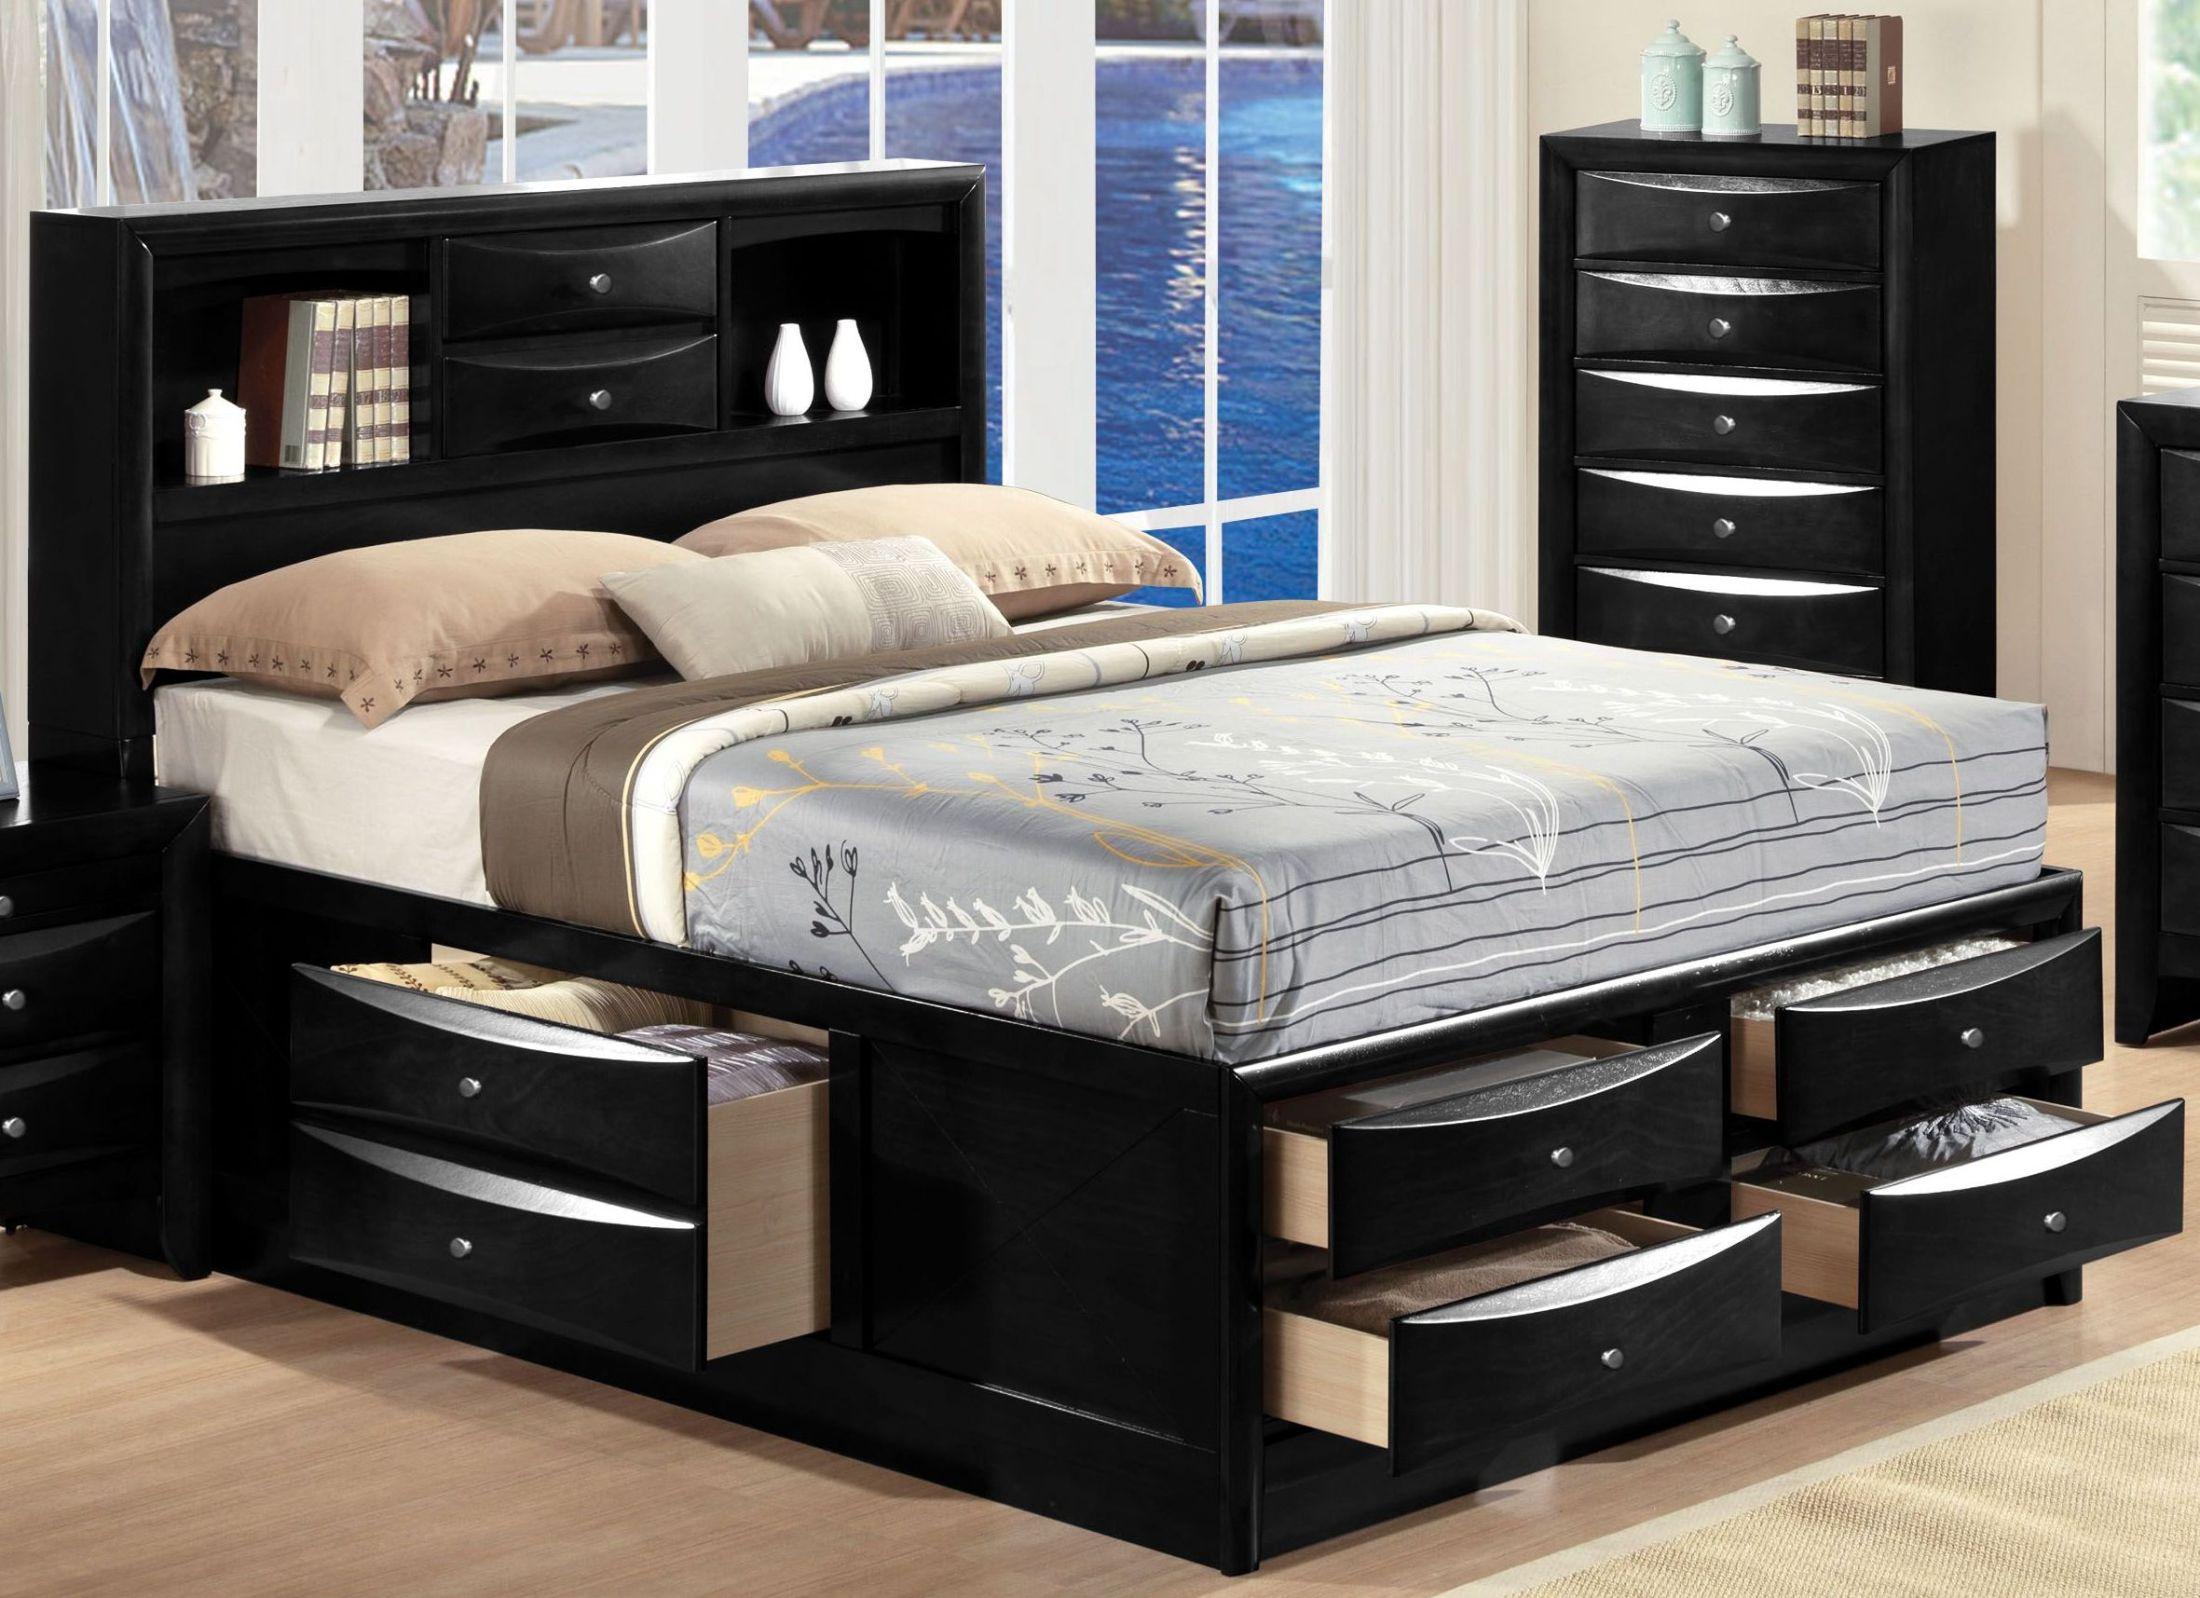 Image of: Ireland Black Full Bookcase Storage Bed 1stopbedrooms